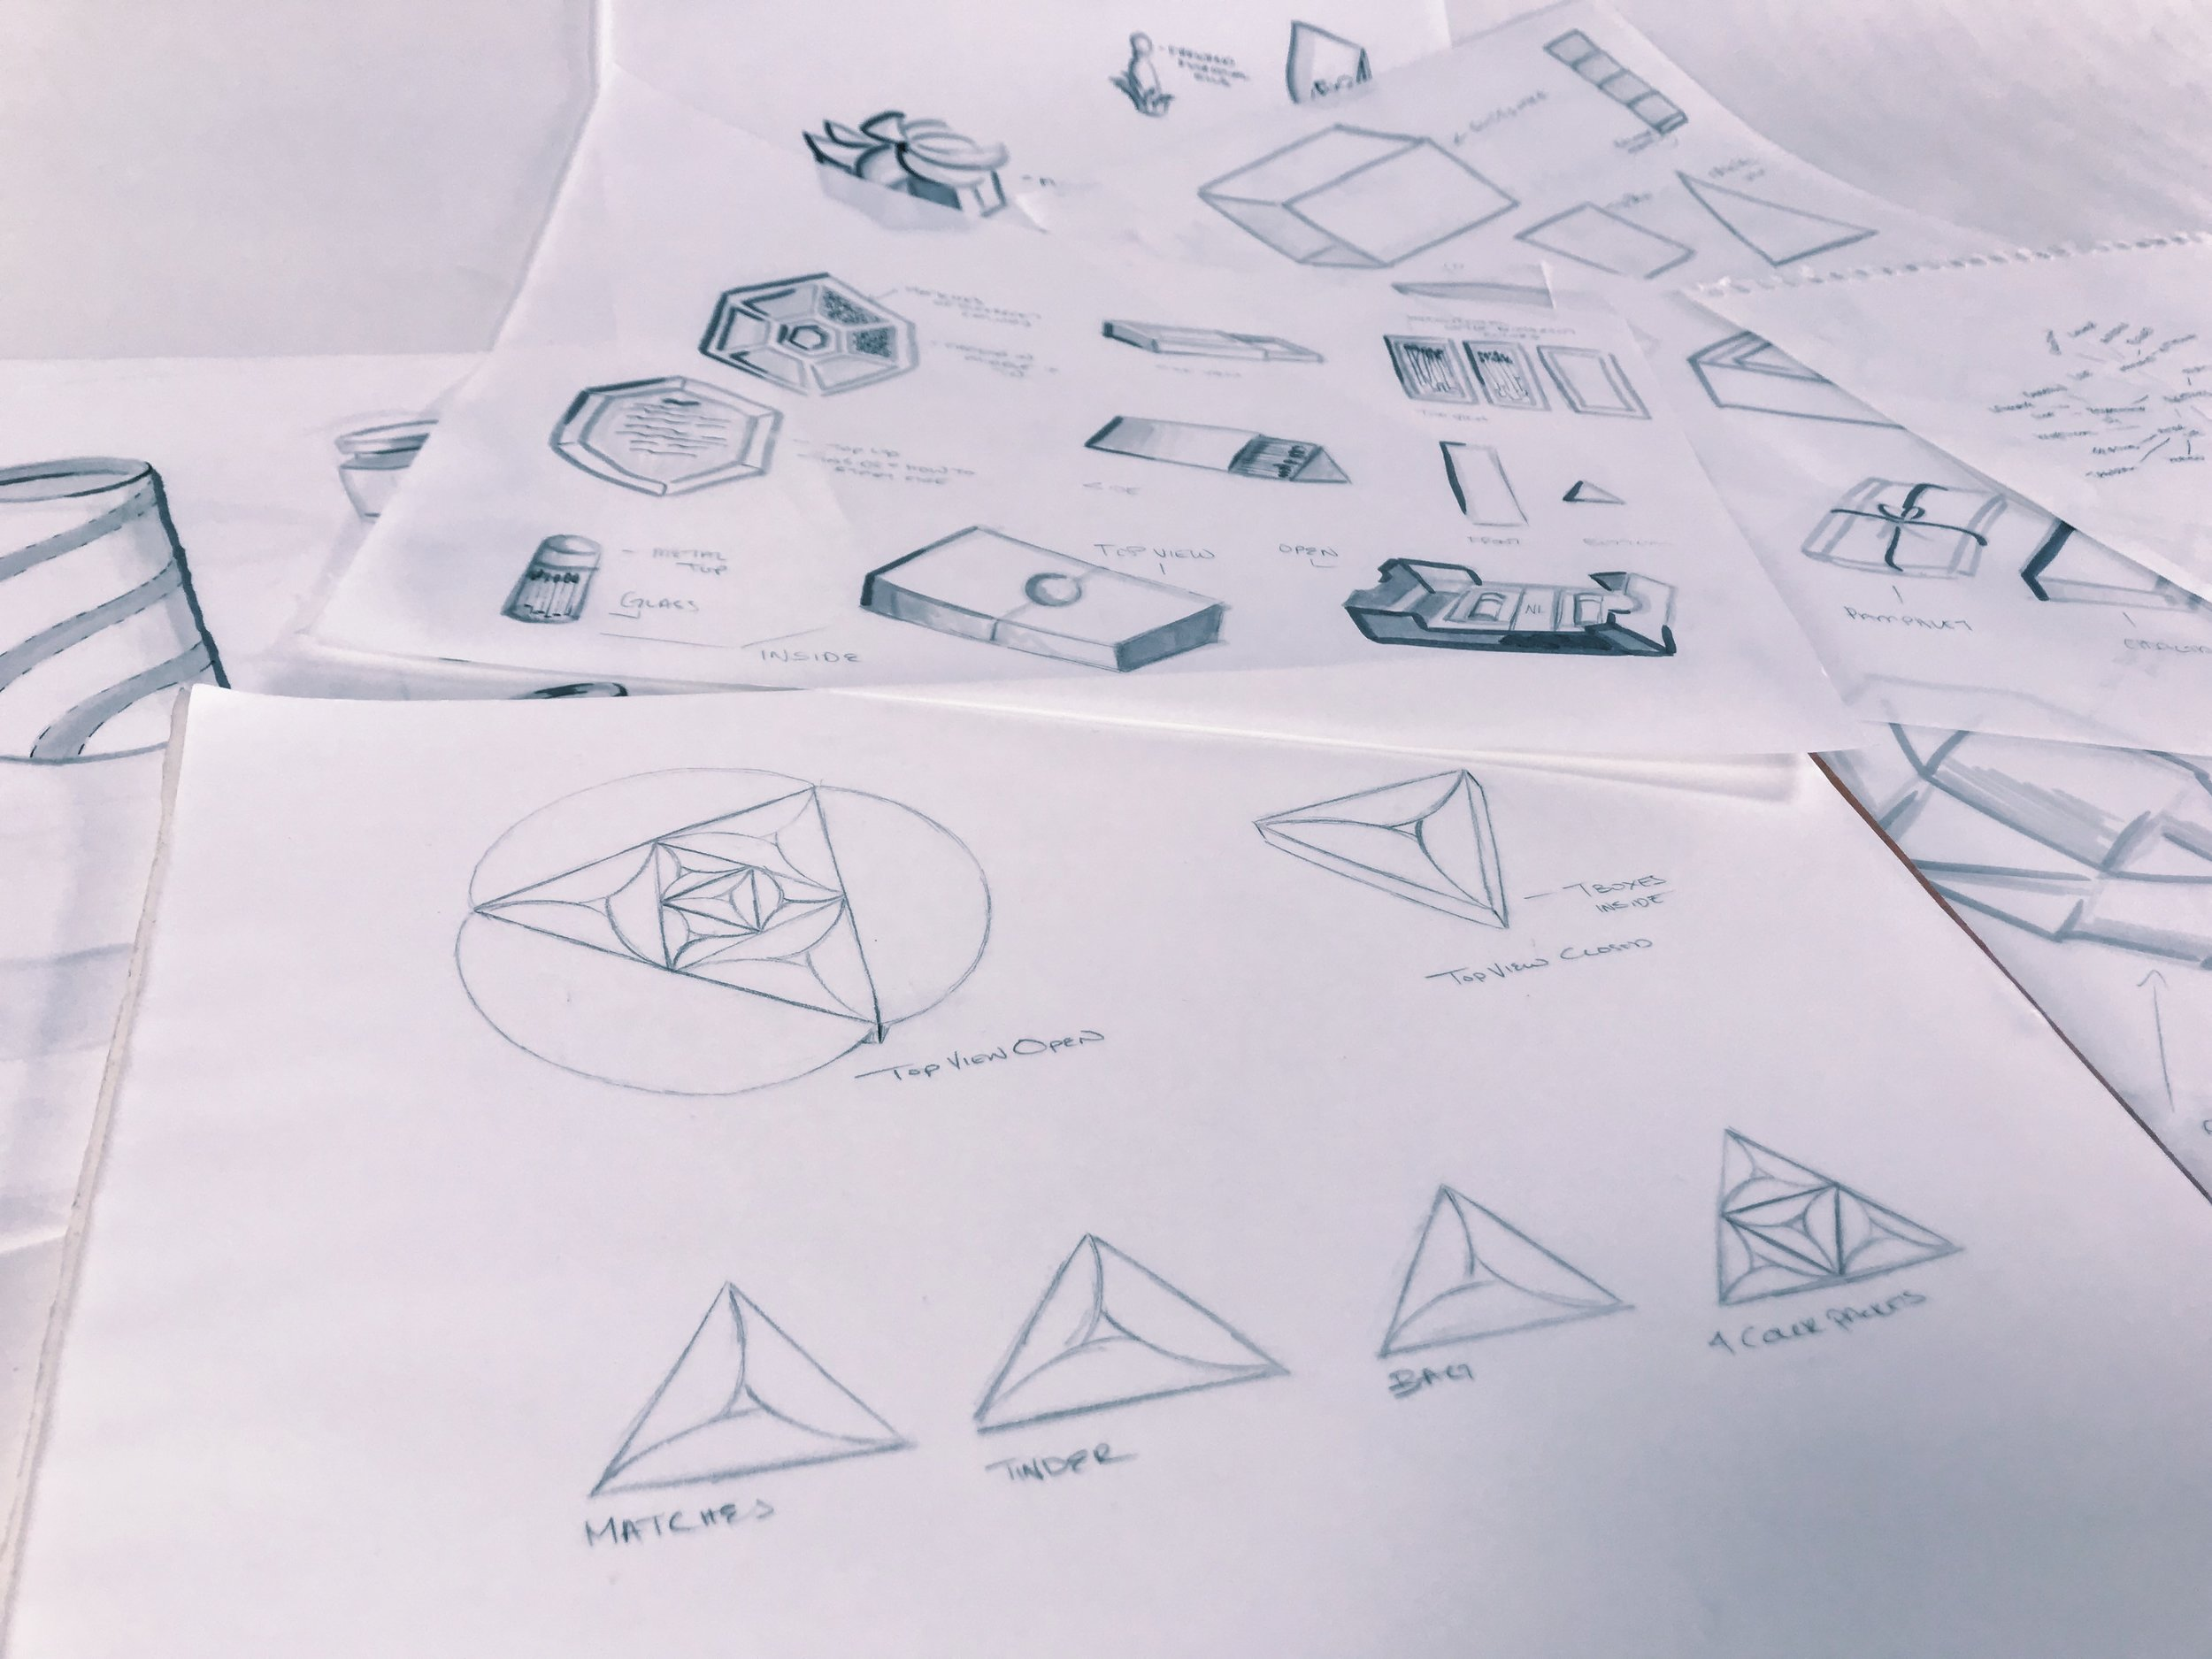 Sketches & design ideation.